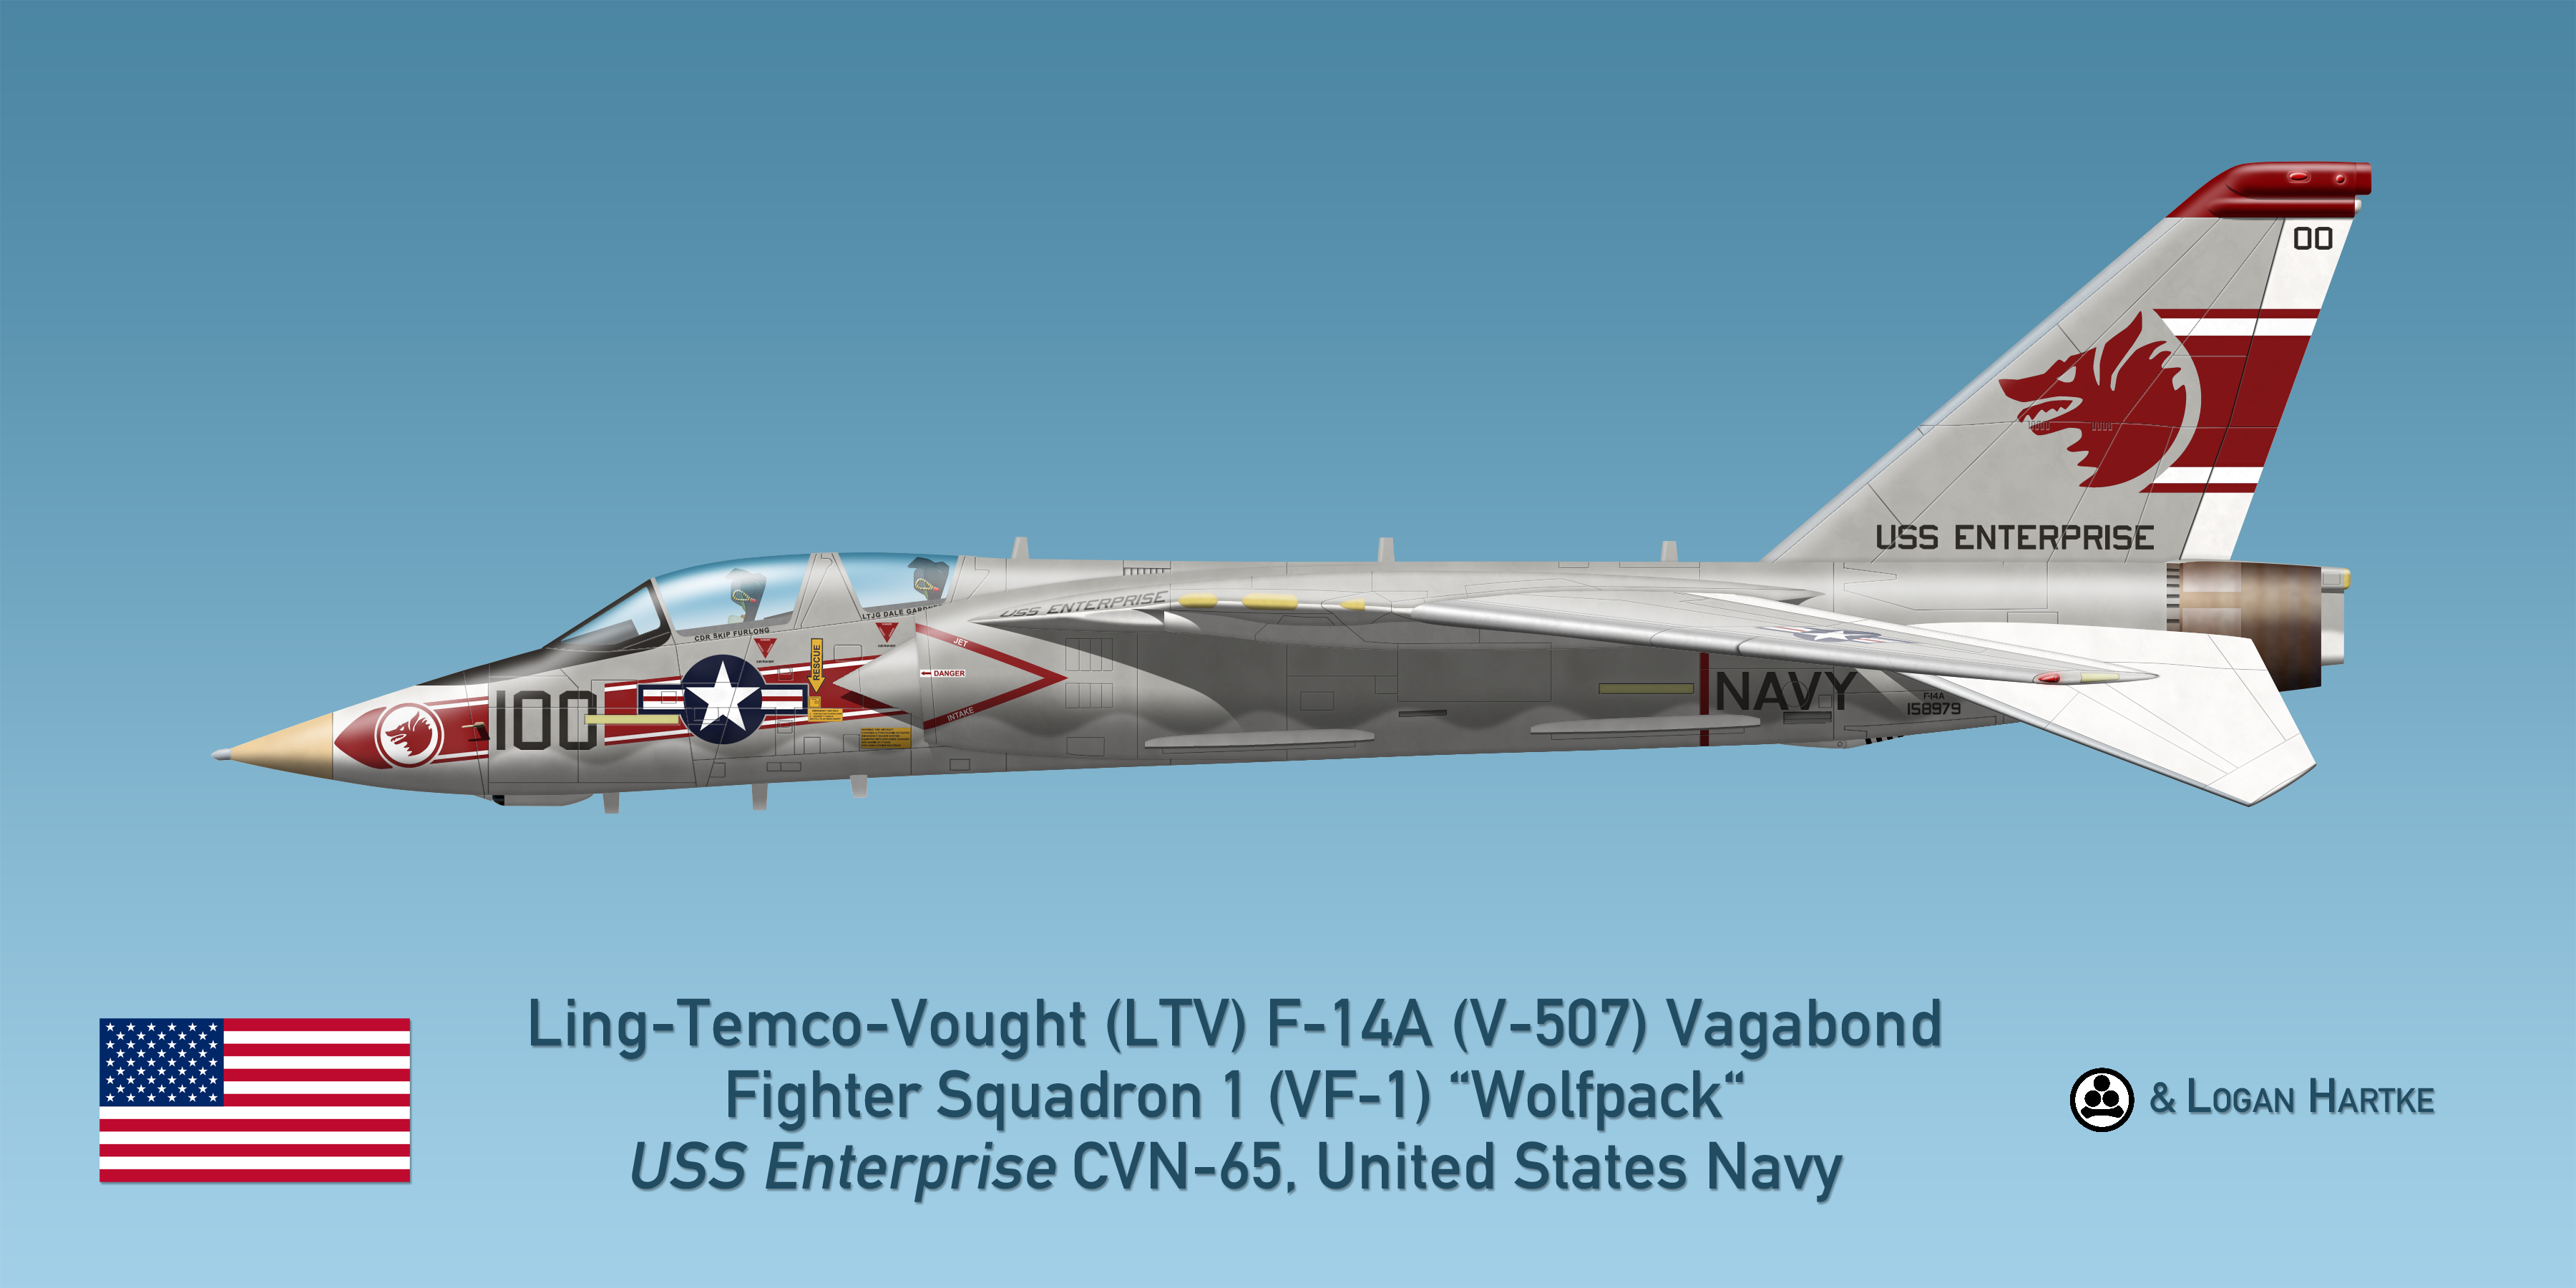 Vought V-507 F-14A Vagabond - VF-1 Wolfpack